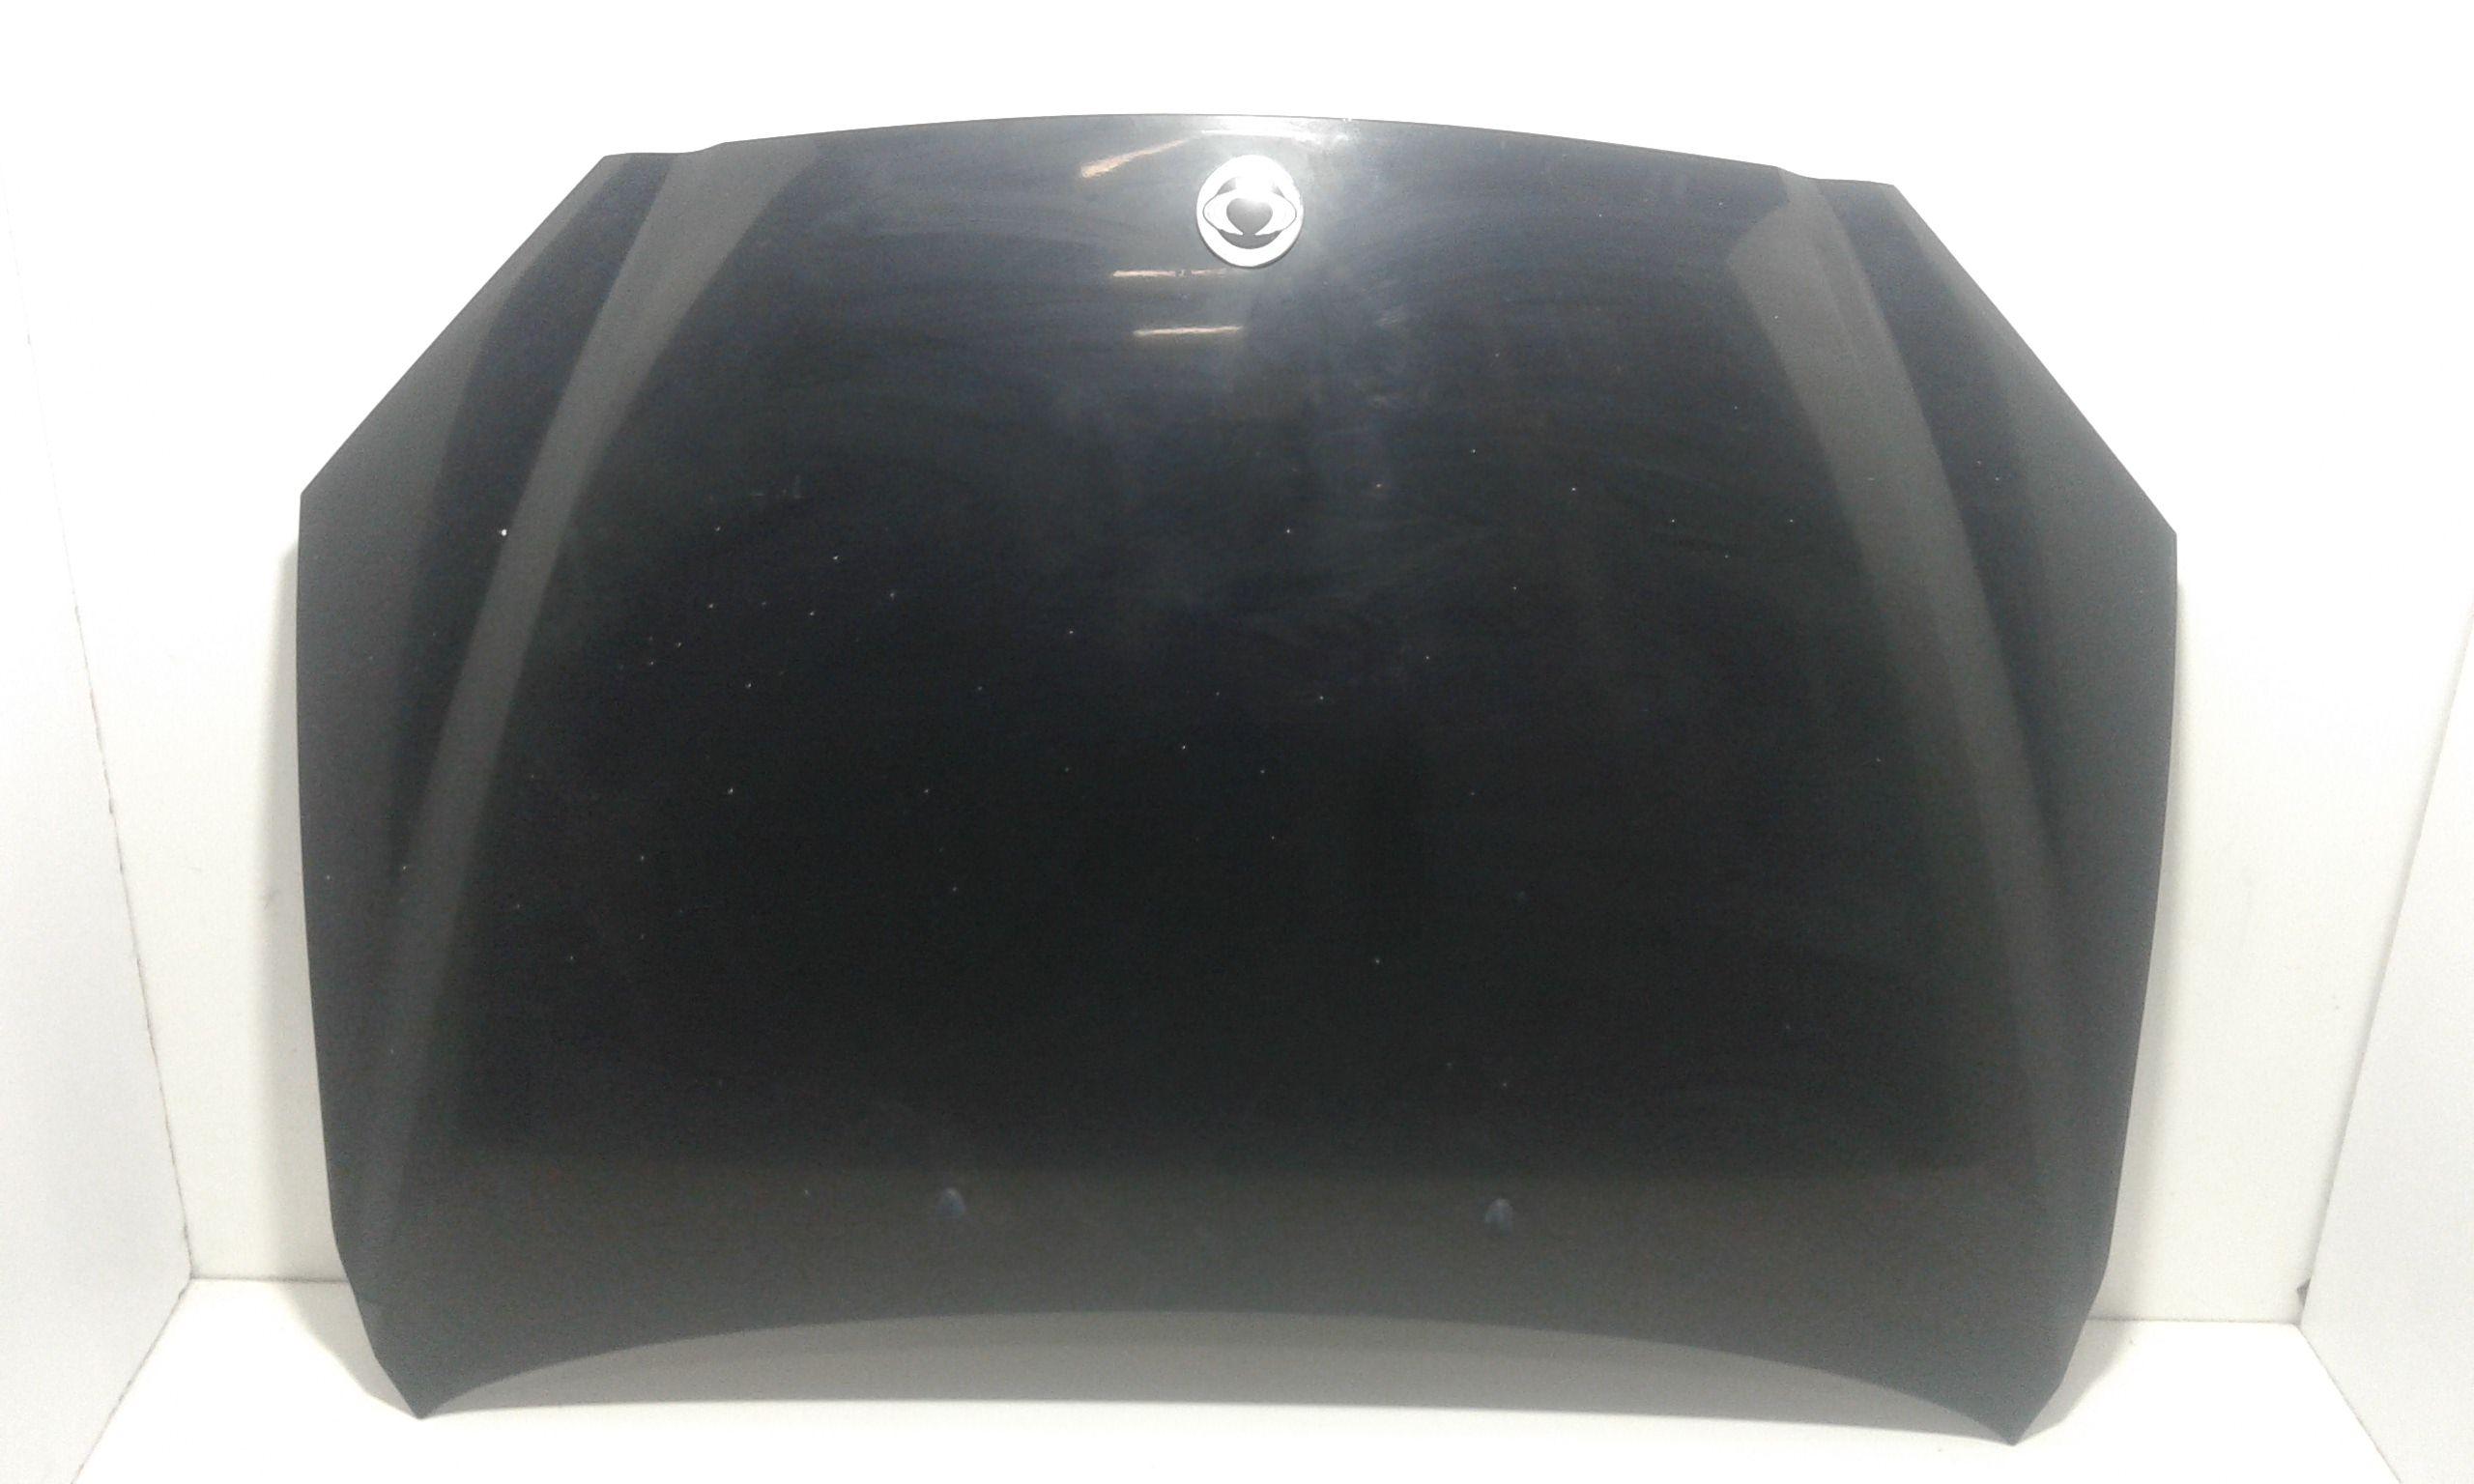 2 x SiS-Tec Gasfeder Motorhaube für SSANGYONG KYRON 410,5 mm